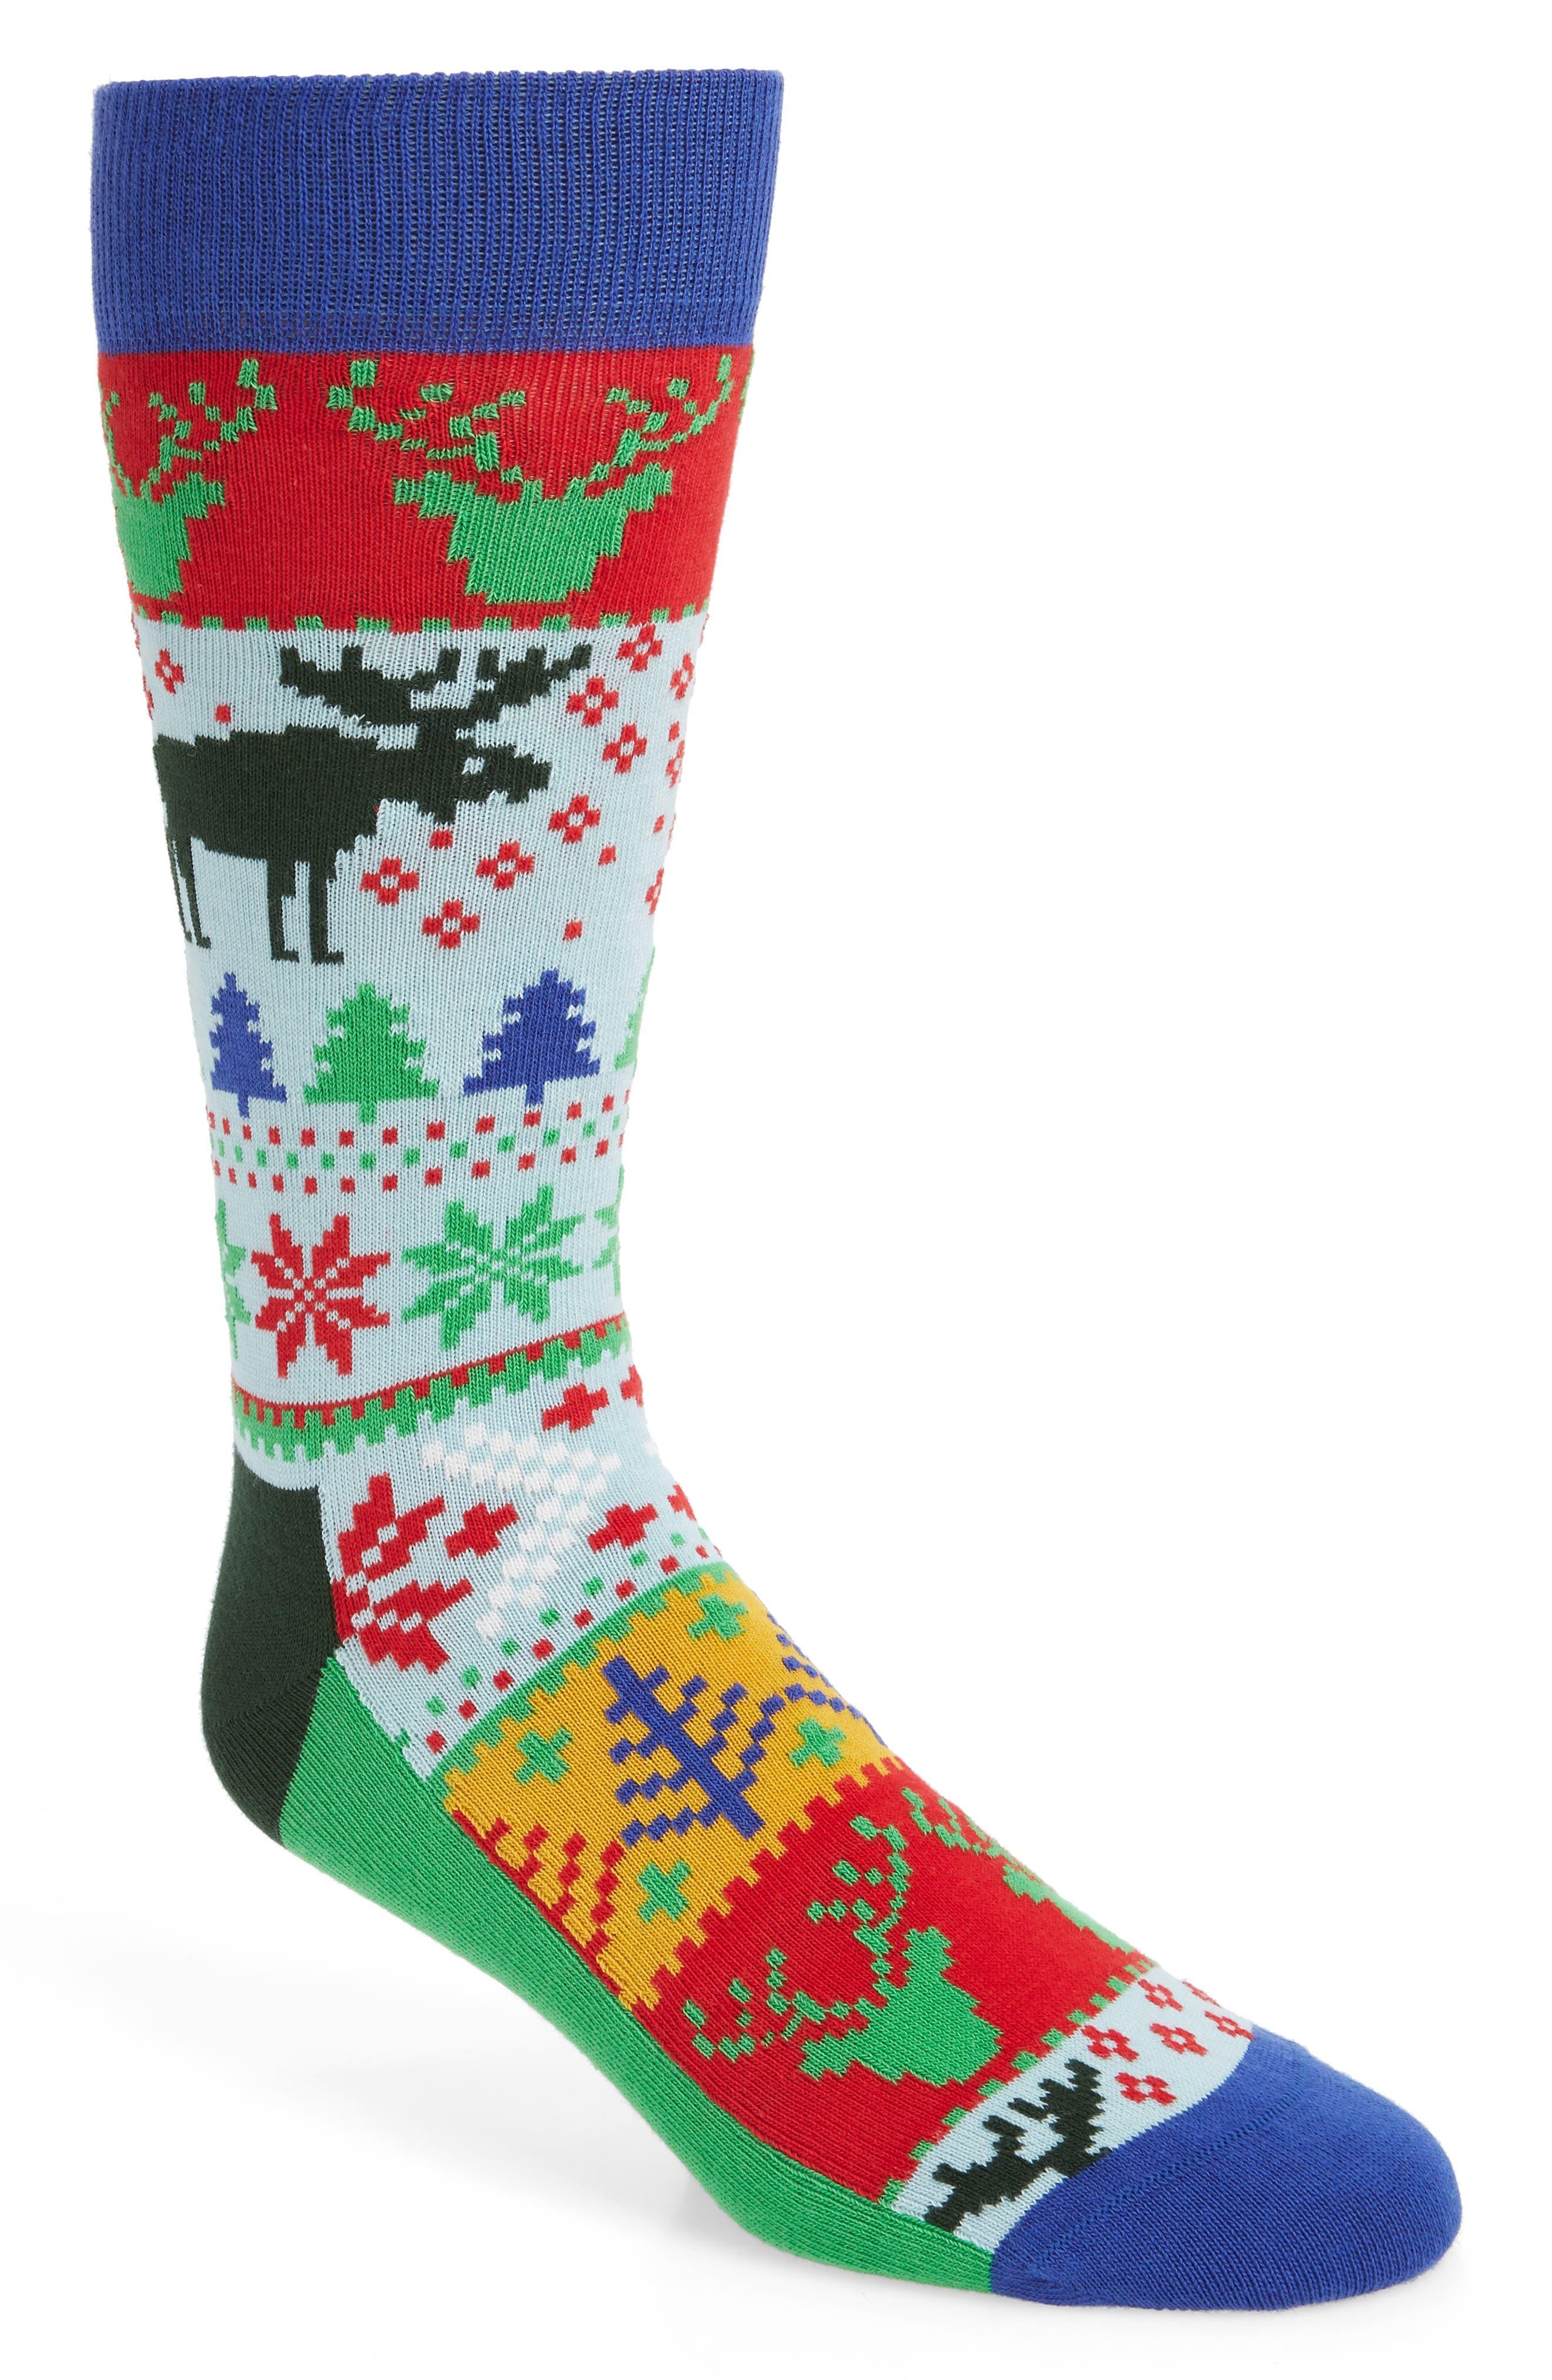 HAPPY SOCKS Holiday Fair Isle Socks in Green Multi